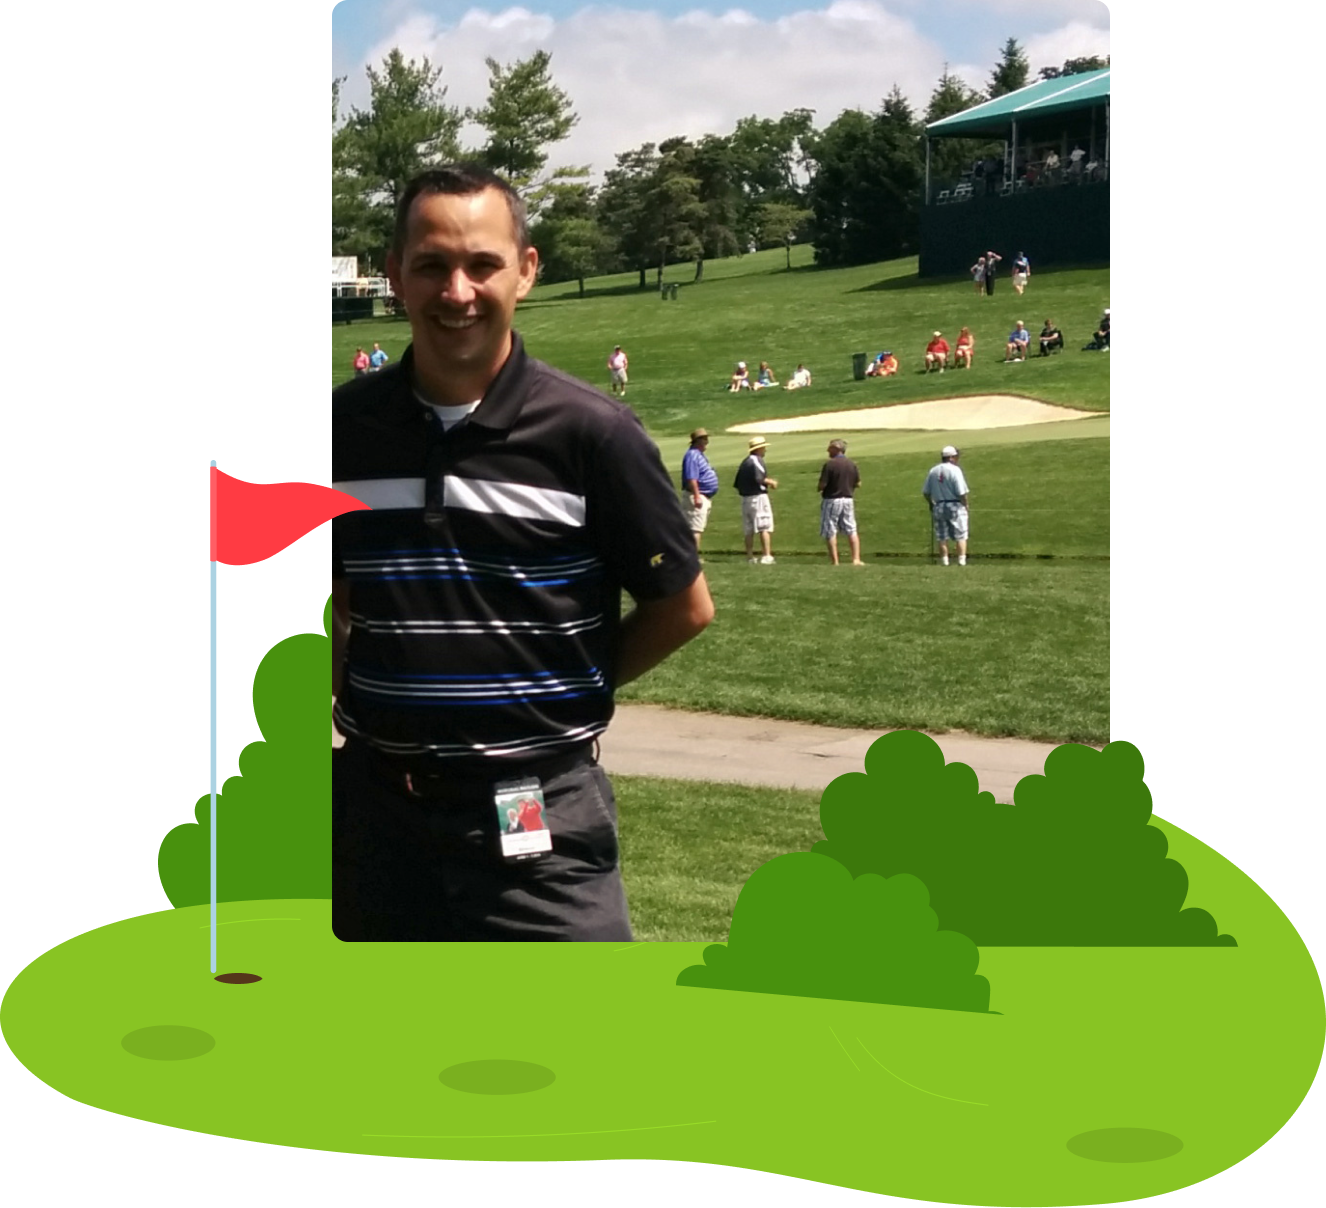 kregg kish on golf course